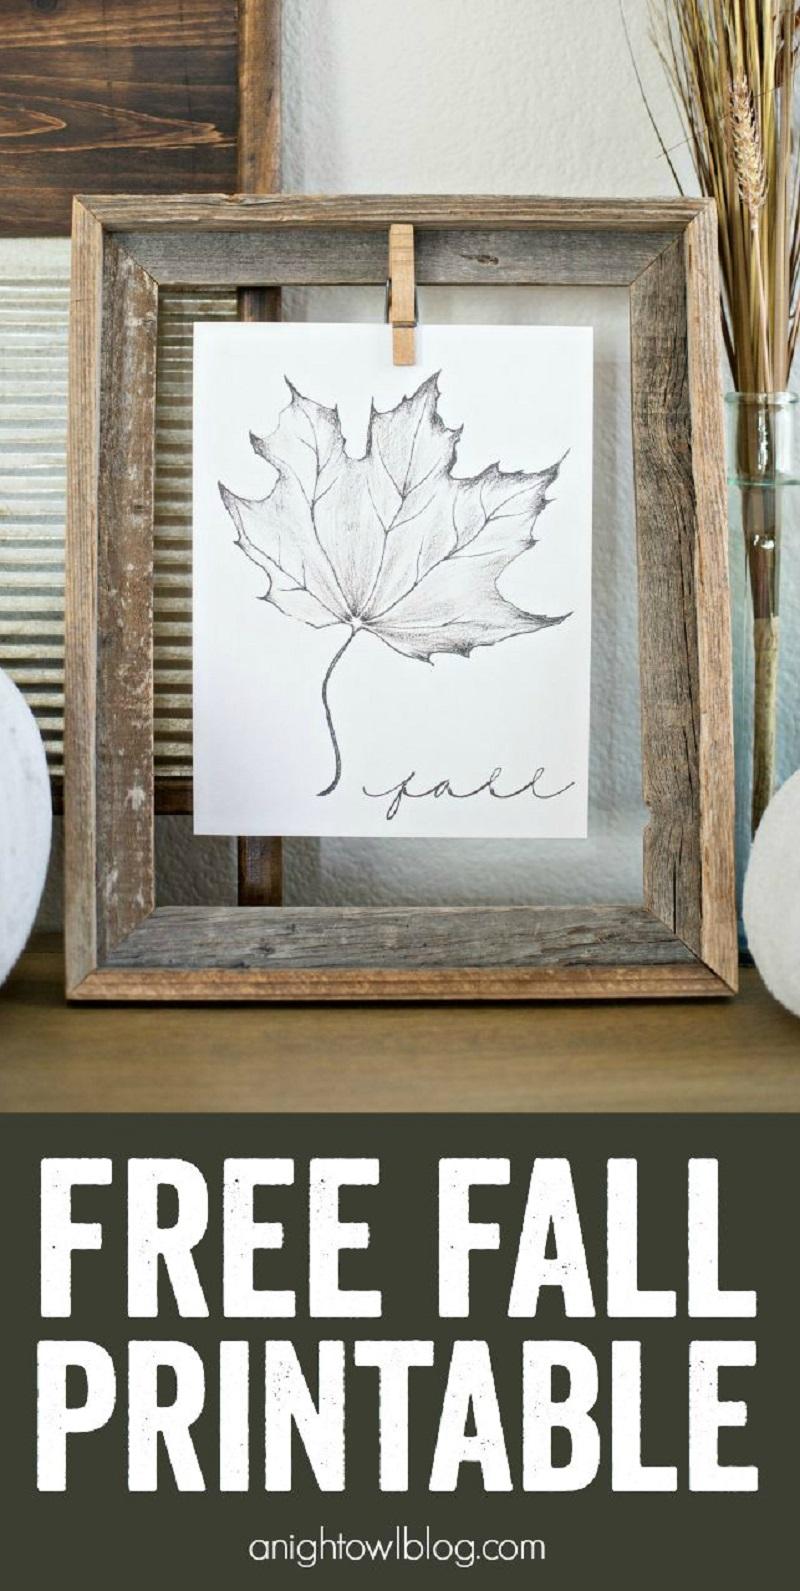 2-free-fall-printable